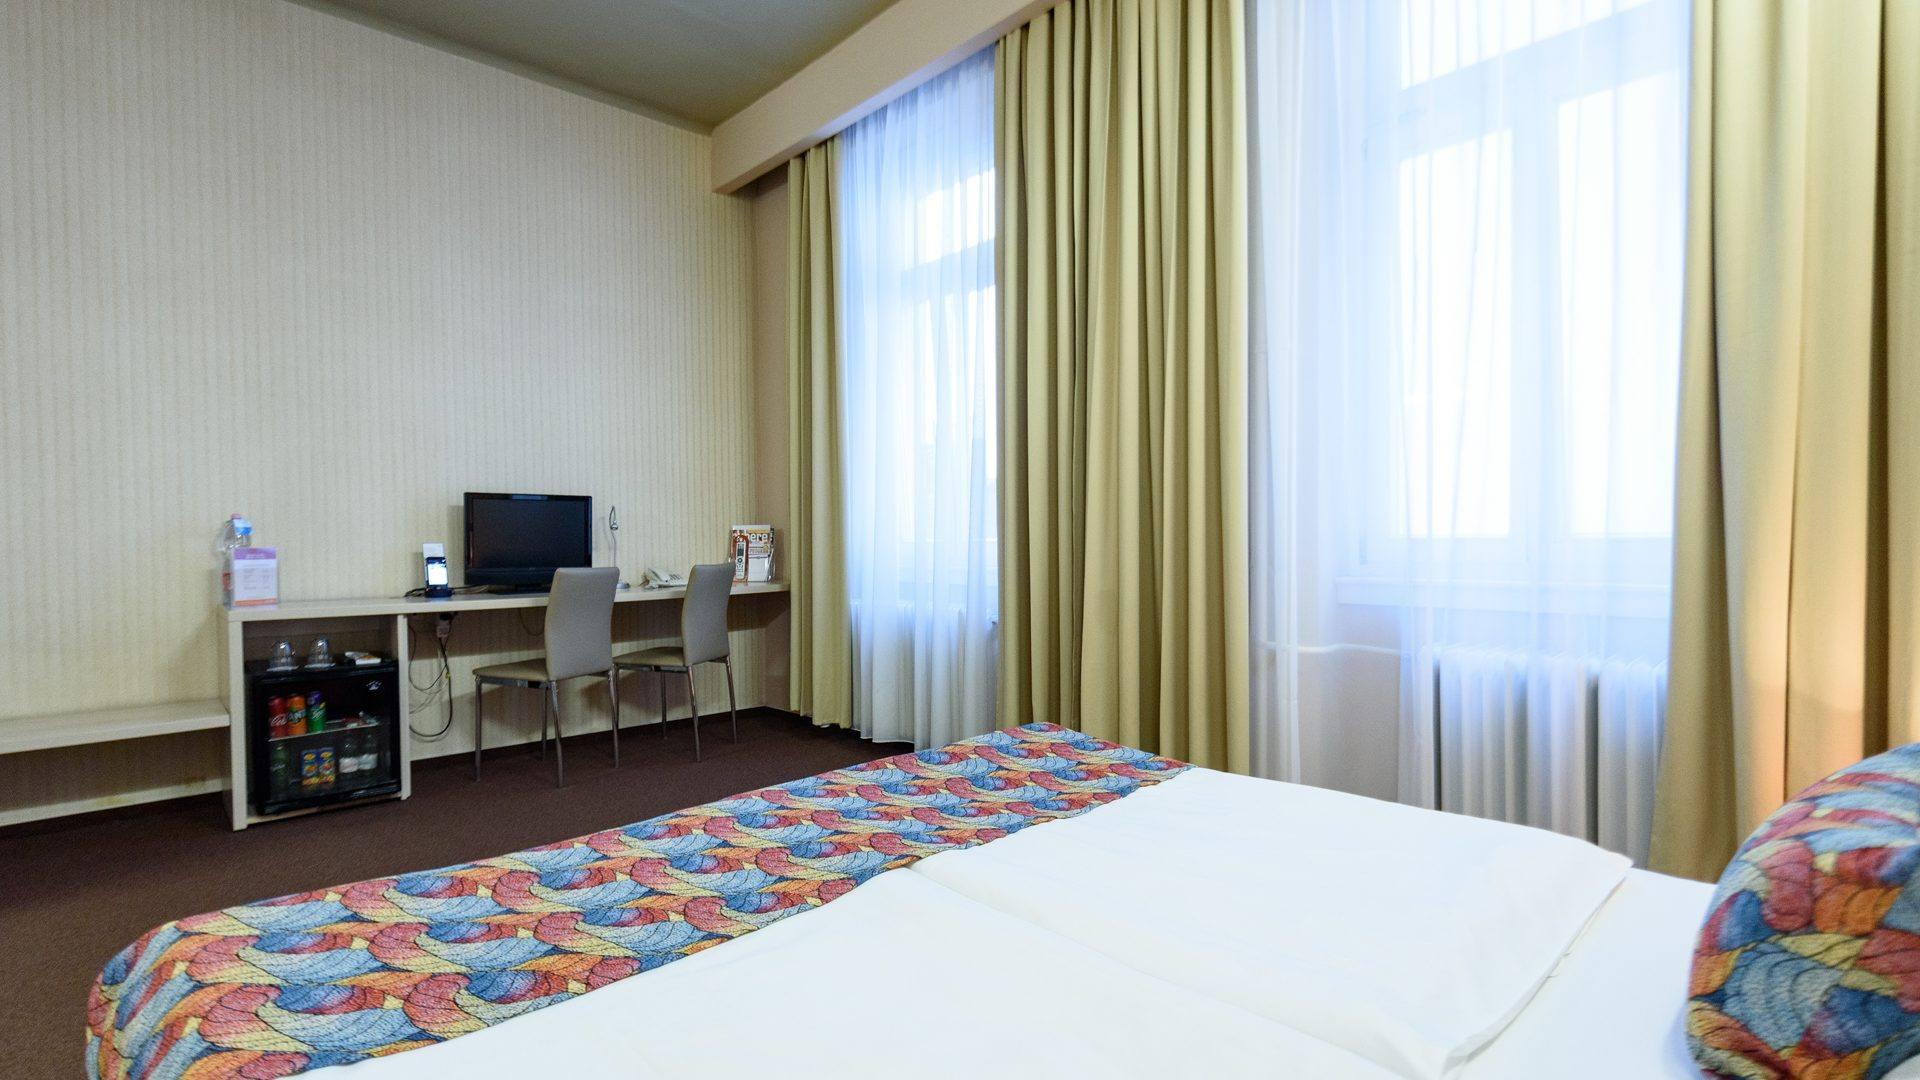 Star City Rooms